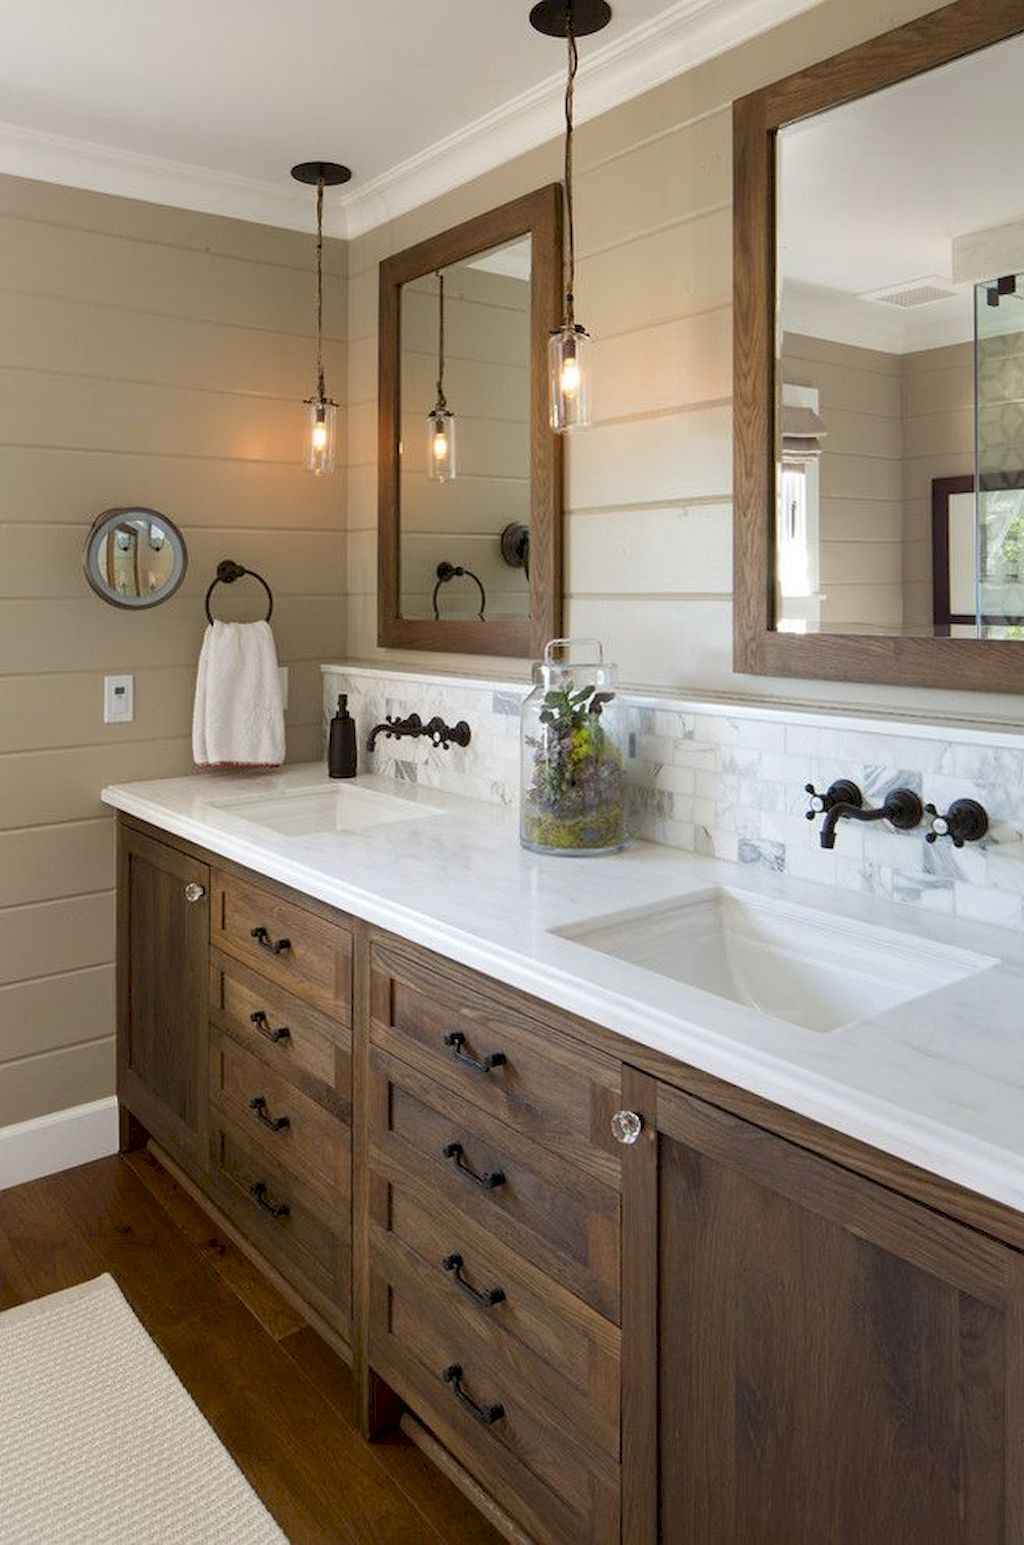 125 awesome farmhouse bathroom vanity remodel ideas (99)